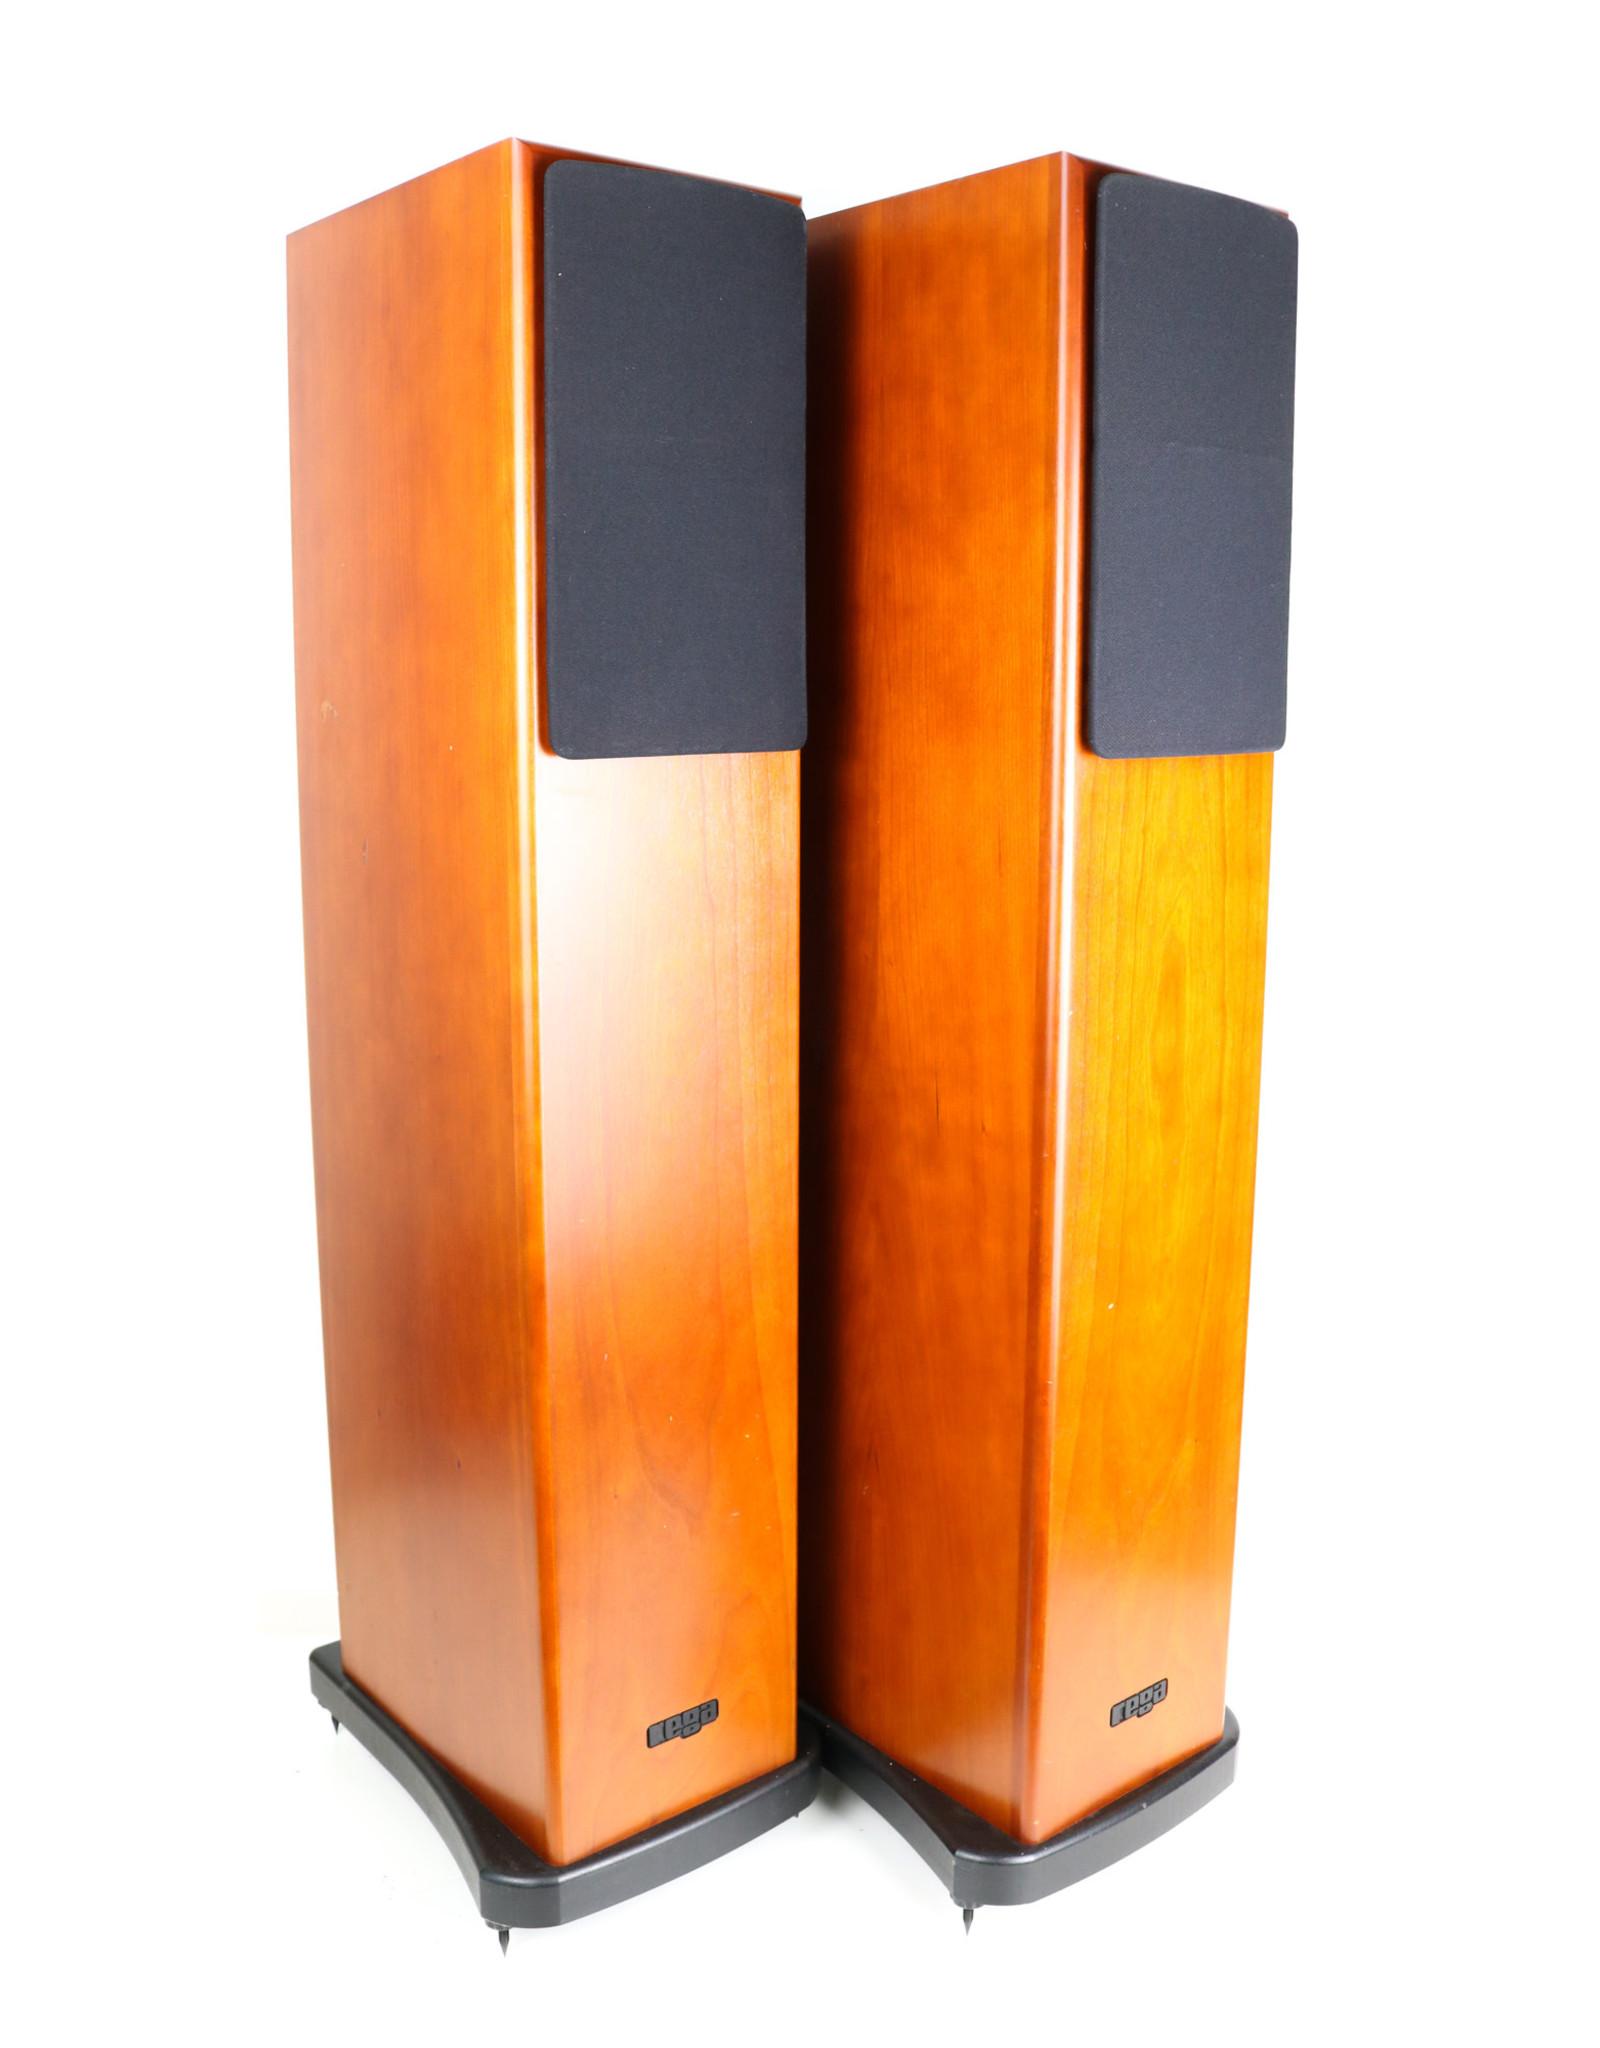 Rega Rega Ela 2000 Floorstanding Speakers Cherry USED